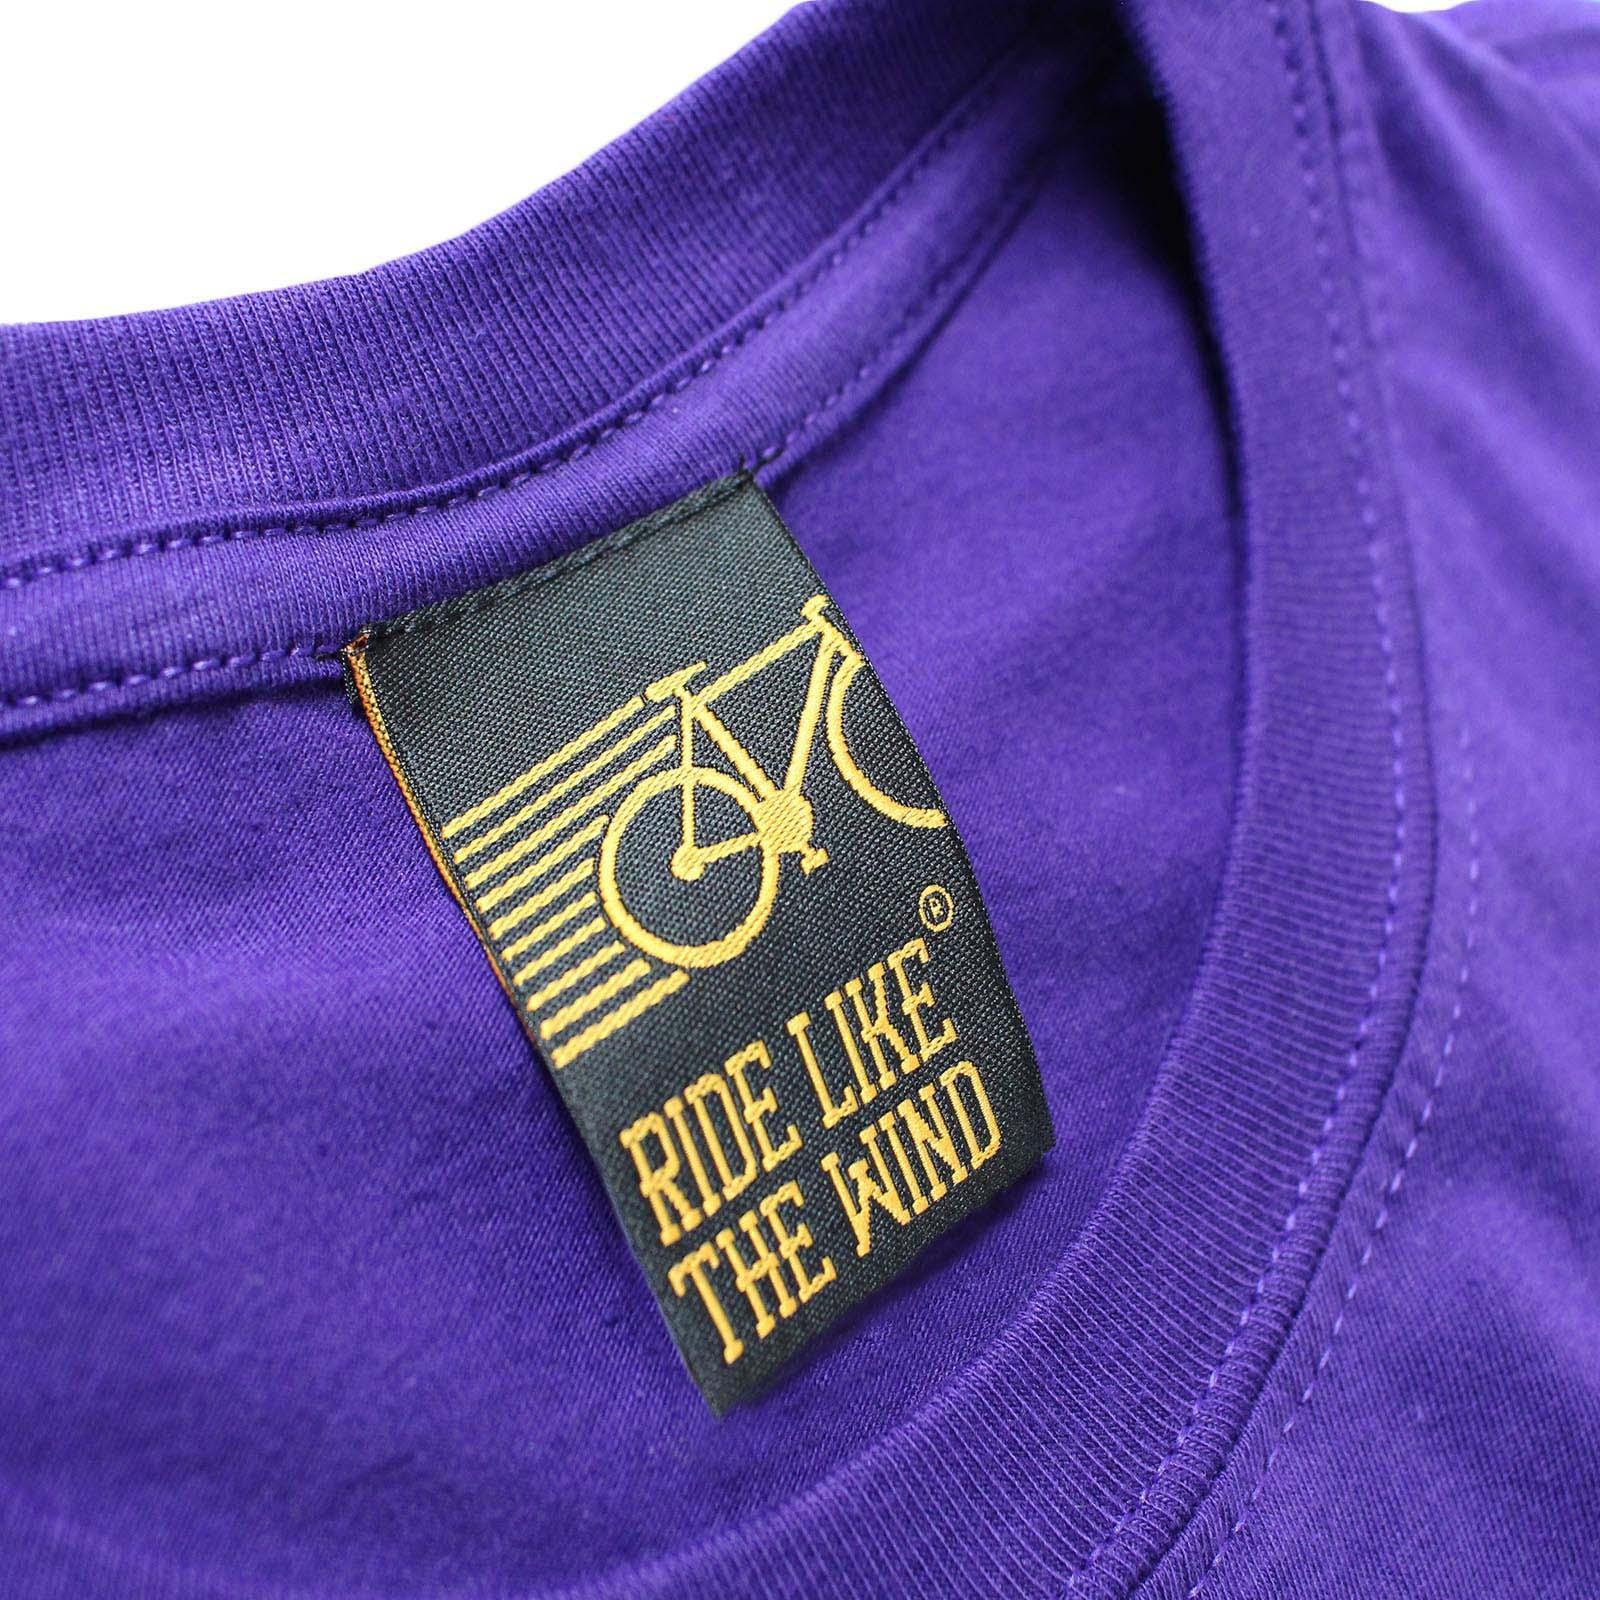 Cycling-T-Shirt-Funny-Novelty-Mens-tee-TShirt-Bike-Part-Words thumbnail 23